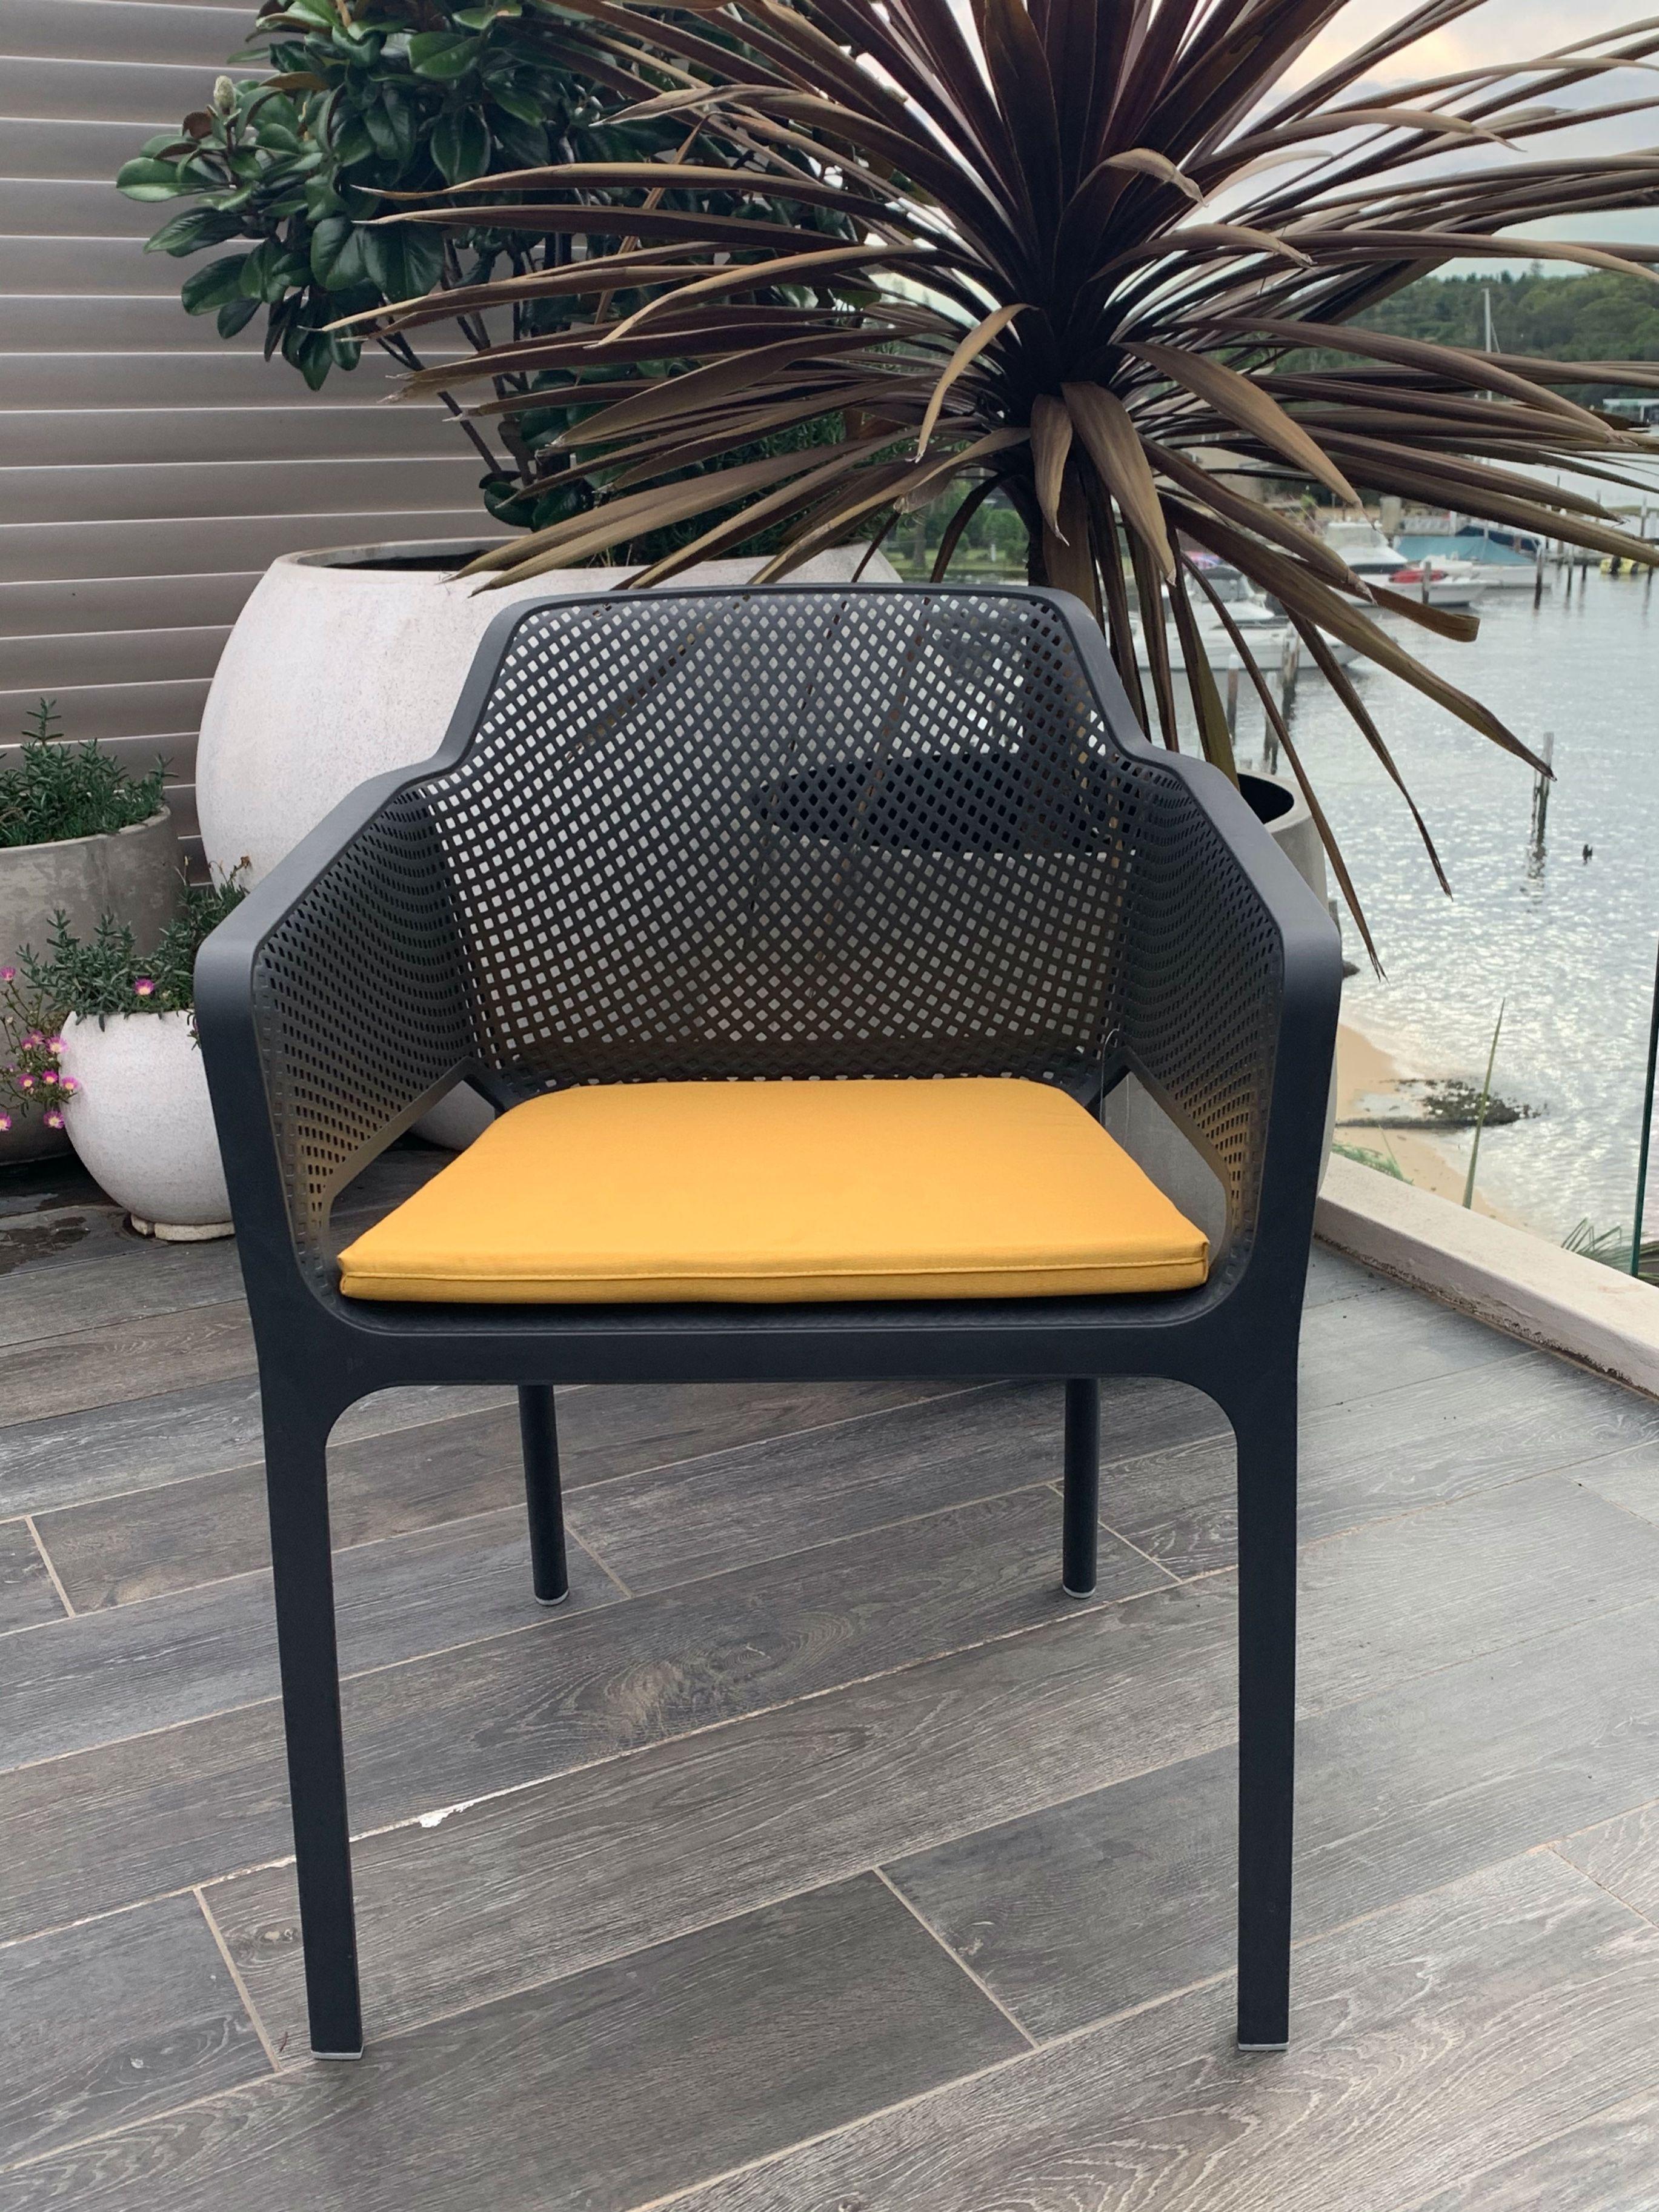 Nardi Net Chair In 2020 Chair Yellow Cushions Outdoor Furniture